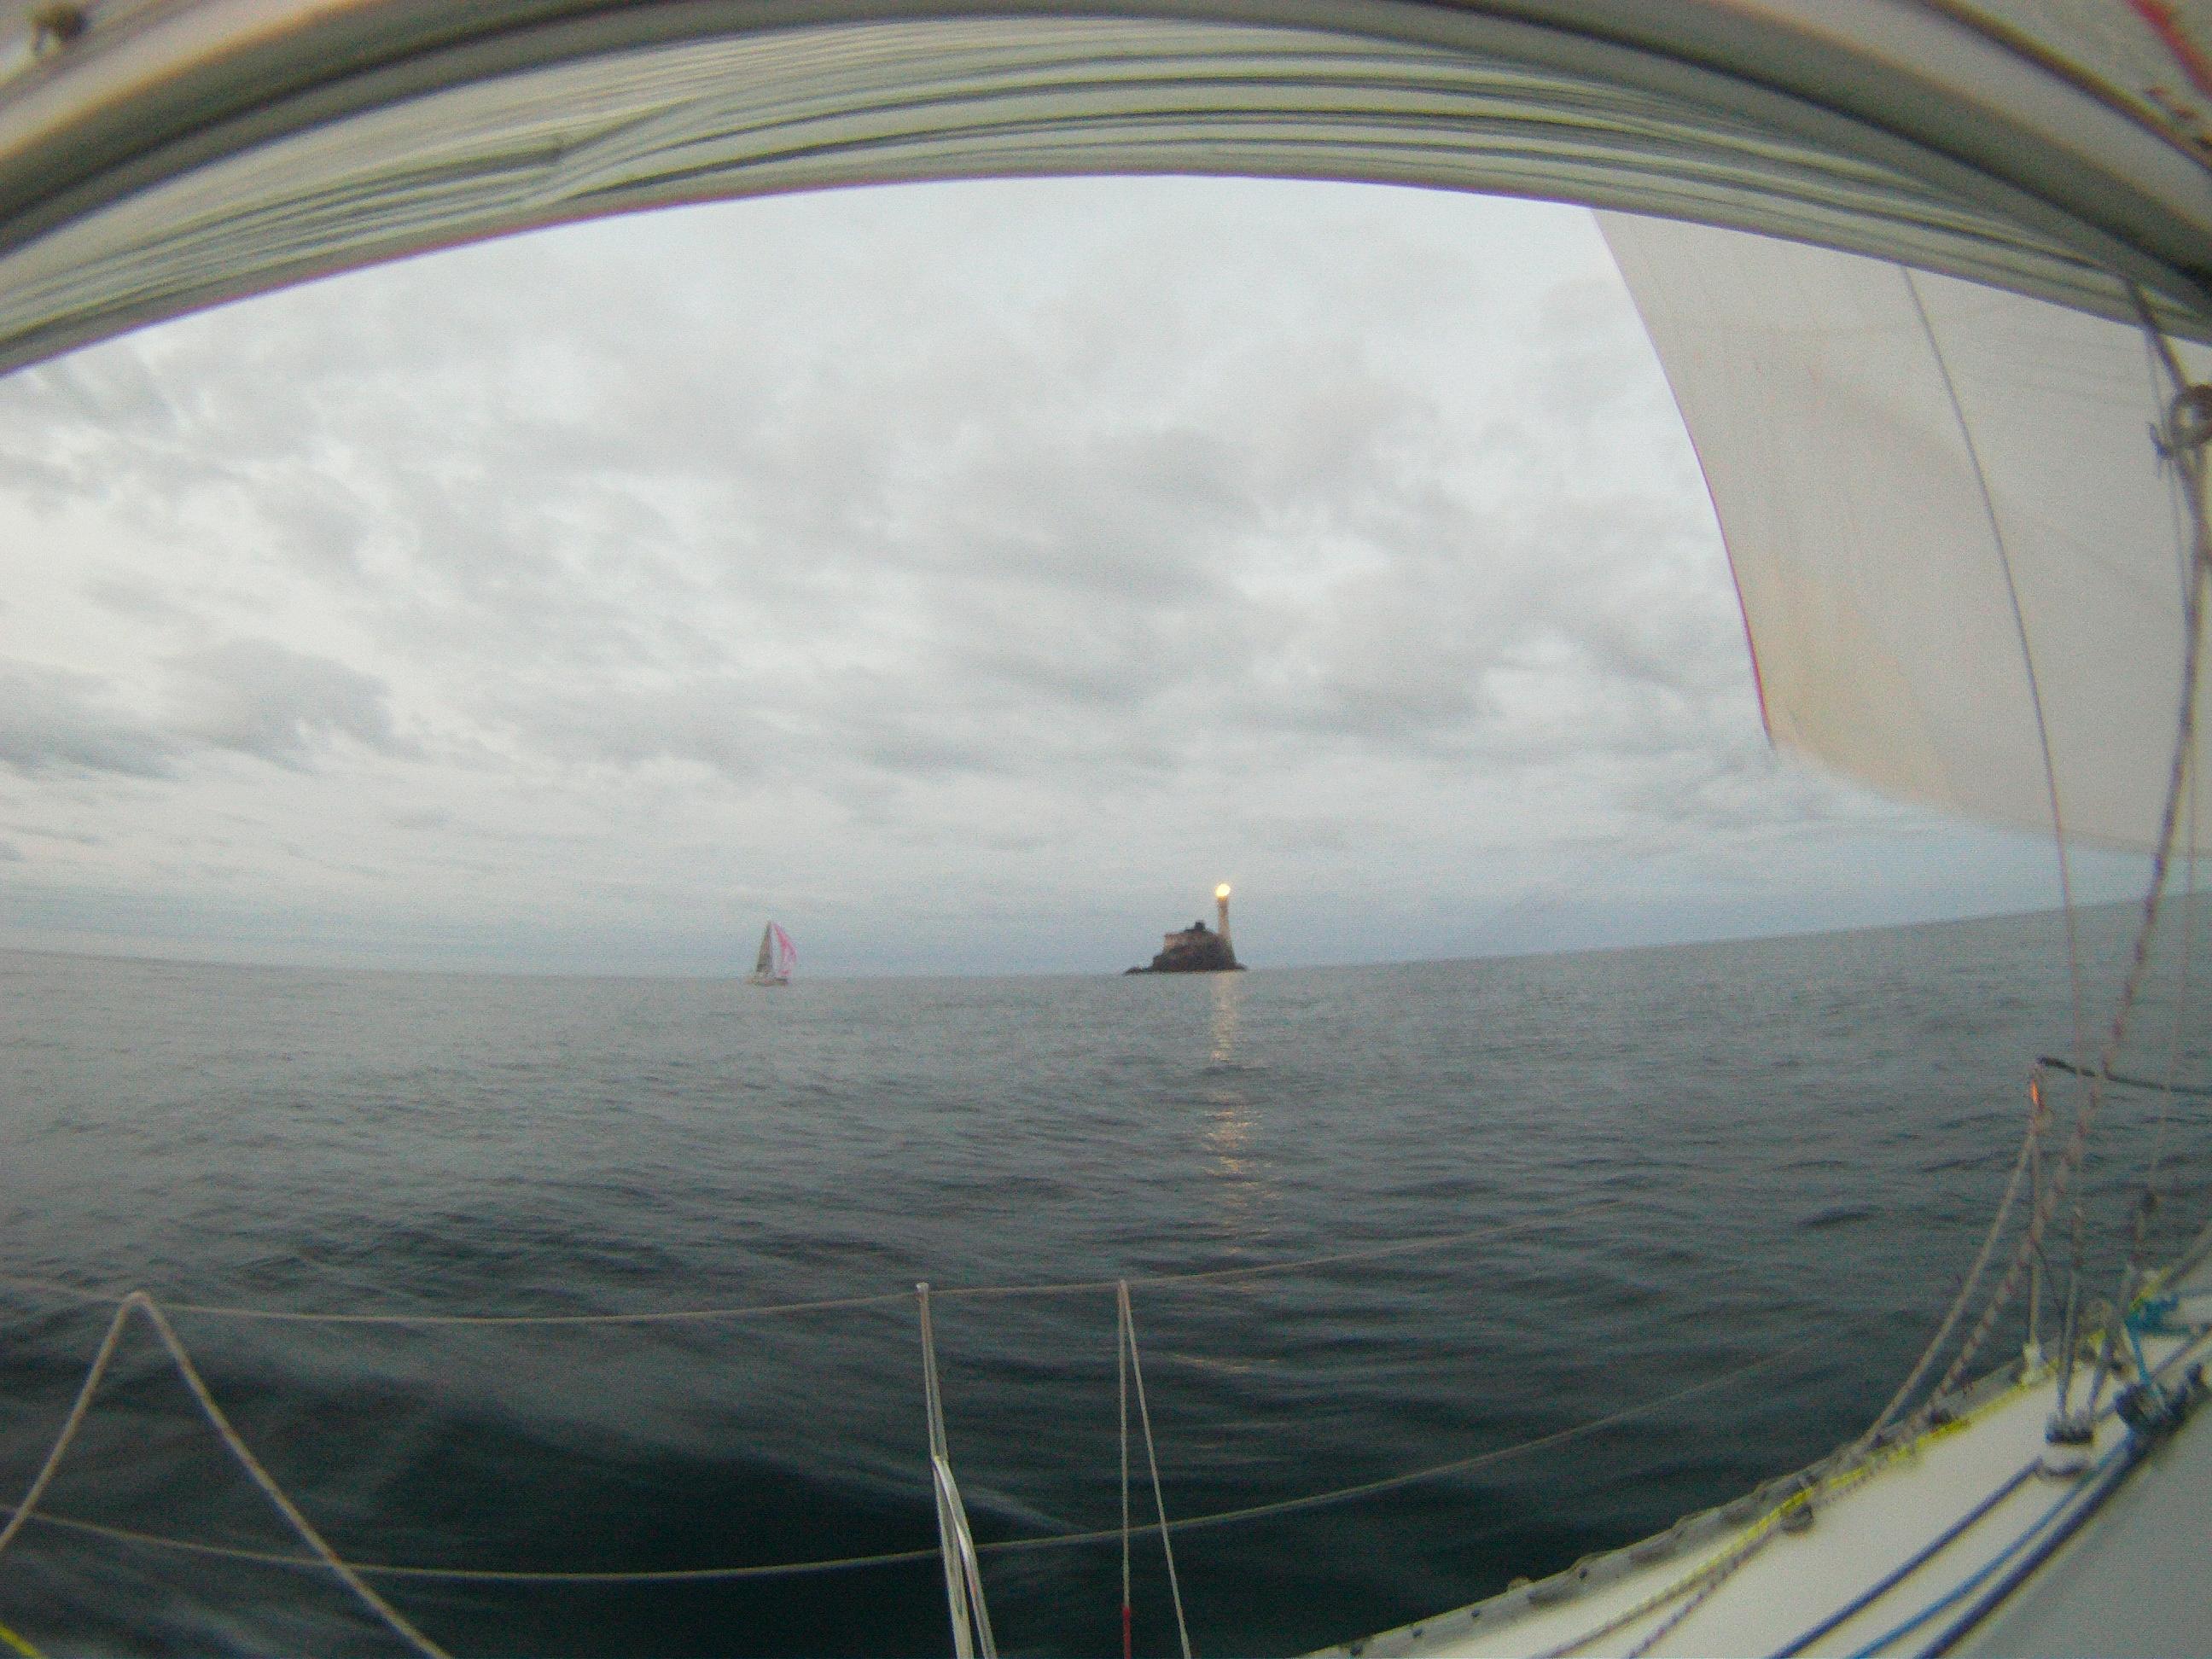 http://www.dinah.sail.ie/wp-content/uploads/2012/04/GOPR8495.jpg